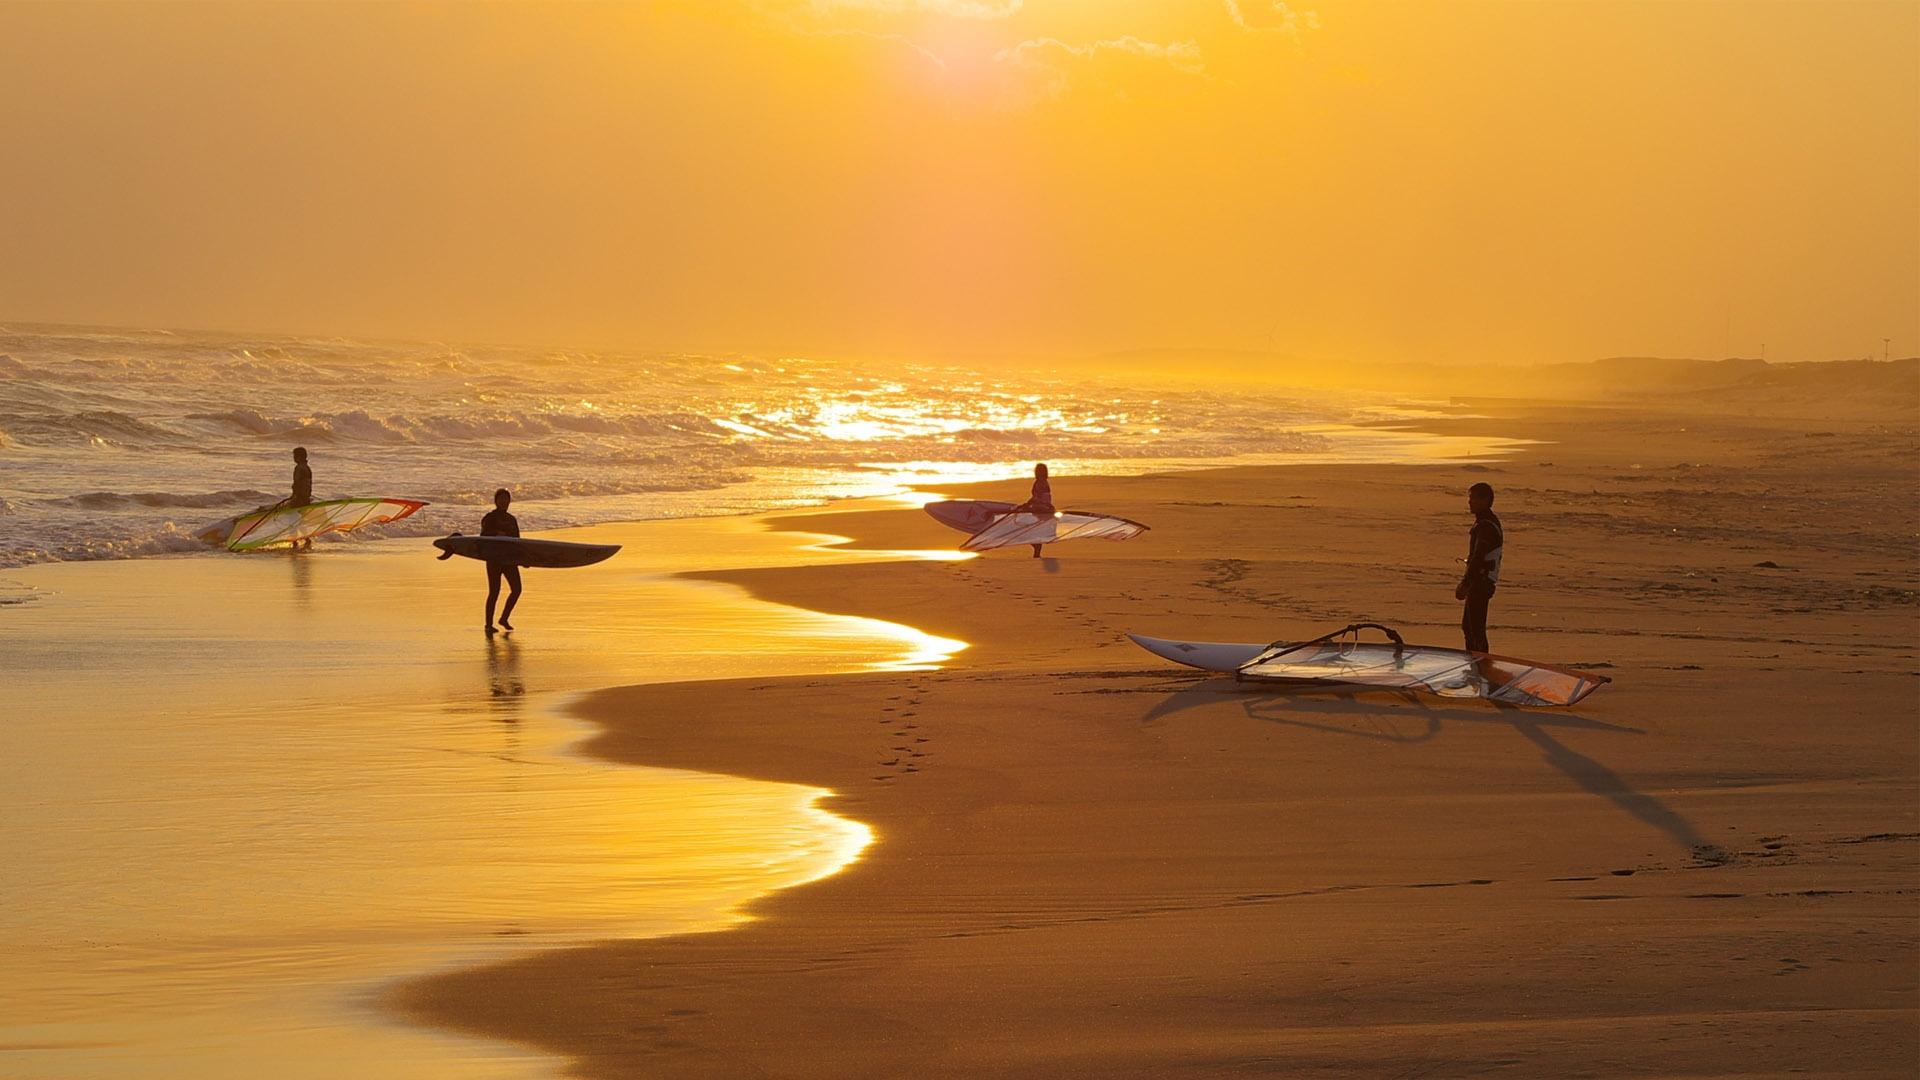 Morning Surfing Wallpaper HD Summer Wallpaper Desktop Background 1920x1080